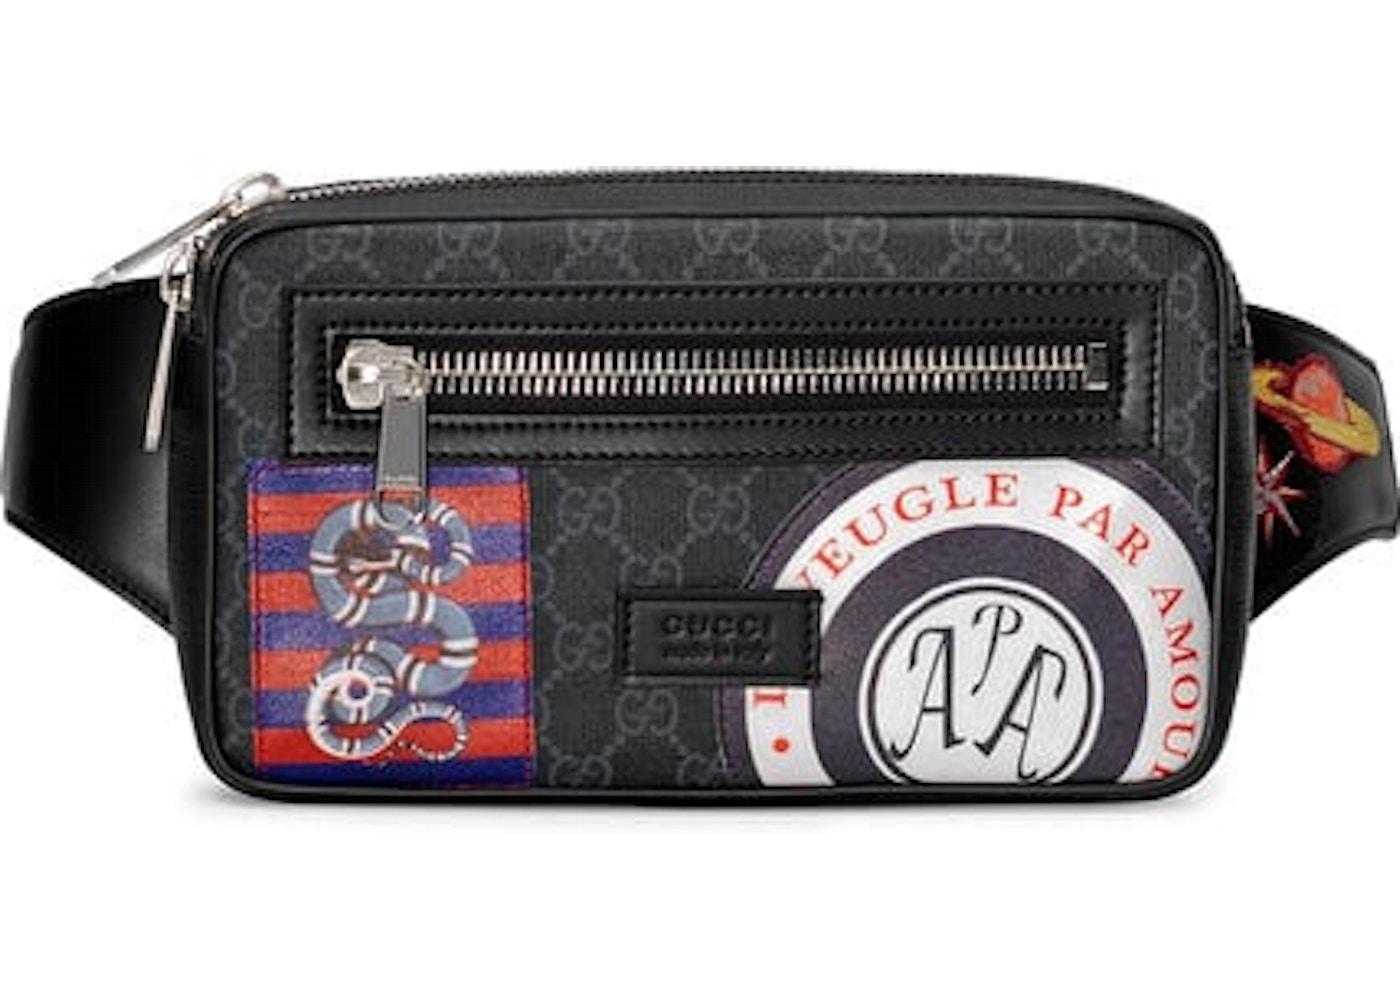 95fcd8e77 Gucci Night Courrier Waist Bag GG Supreme Soft Black. GG Supreme Soft Black